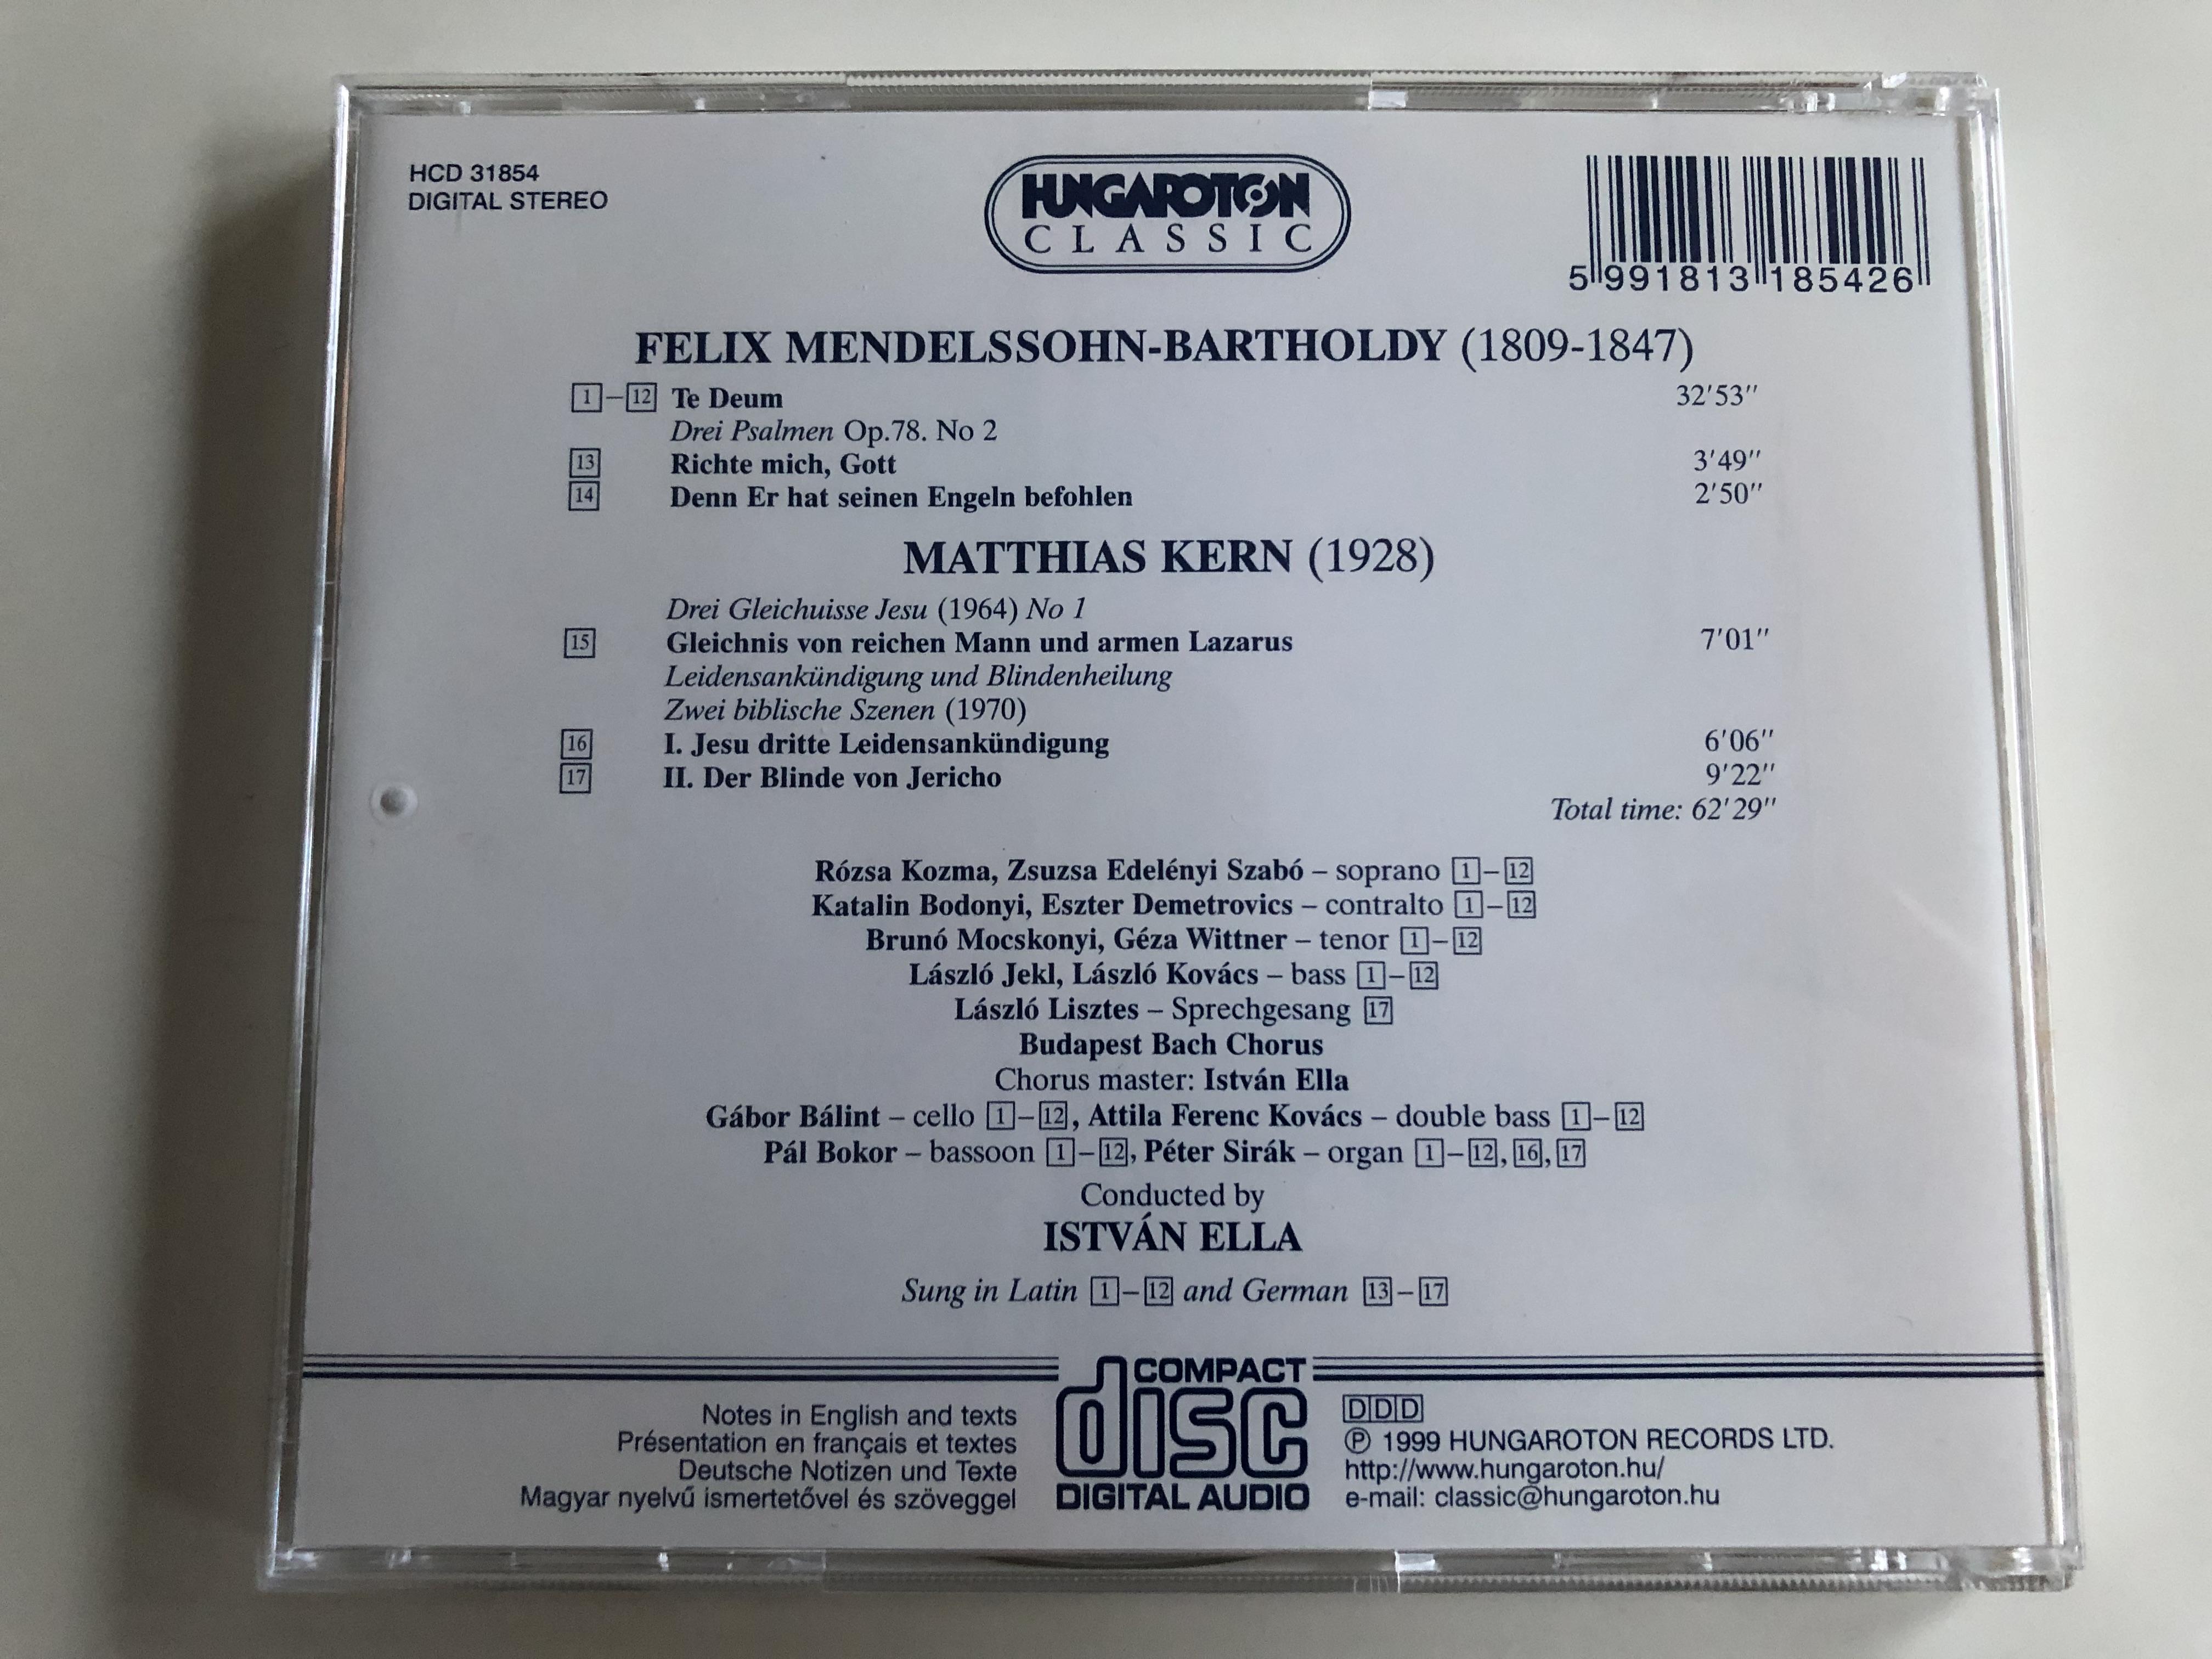 mendelssohn-te-deum-psalms-matthias-kern-sacred-choral-works-budapest-bach-chorus-p-ter-sir-k-organ-cond.-istv-n-ella-hungaroton-classic-audio-cd-1999-hcd-31854-8-.jpg